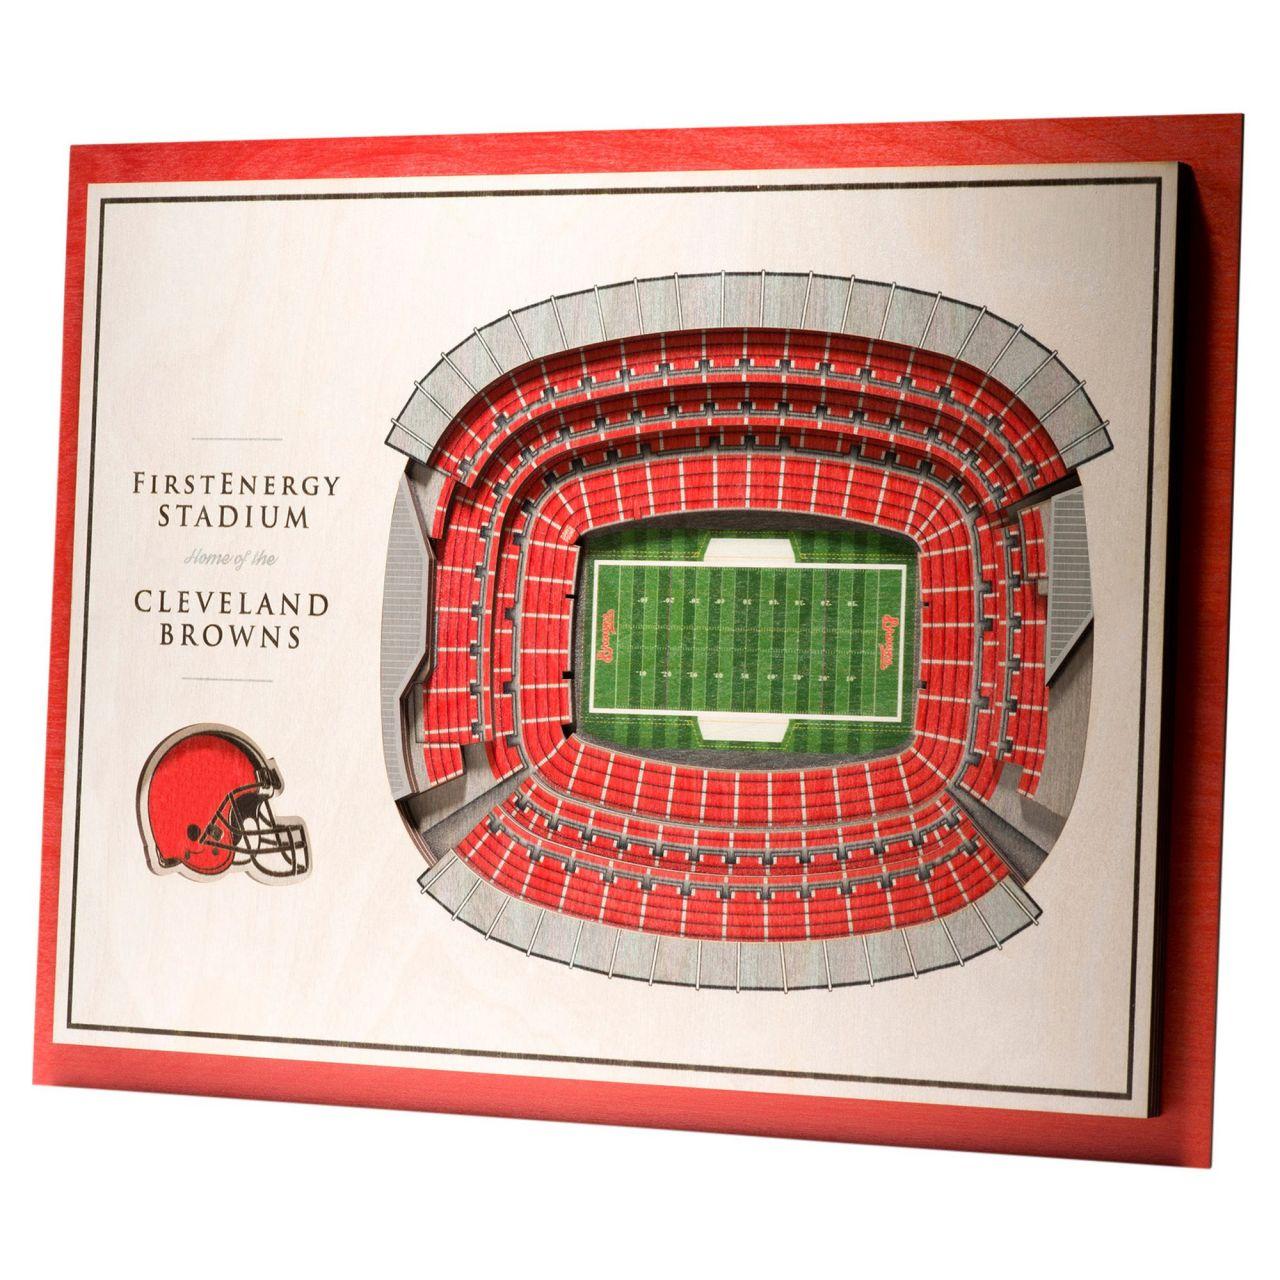 amfoo - YouTheFan Holz Wanddeko Stadion Cleveland Browns 43x33cm